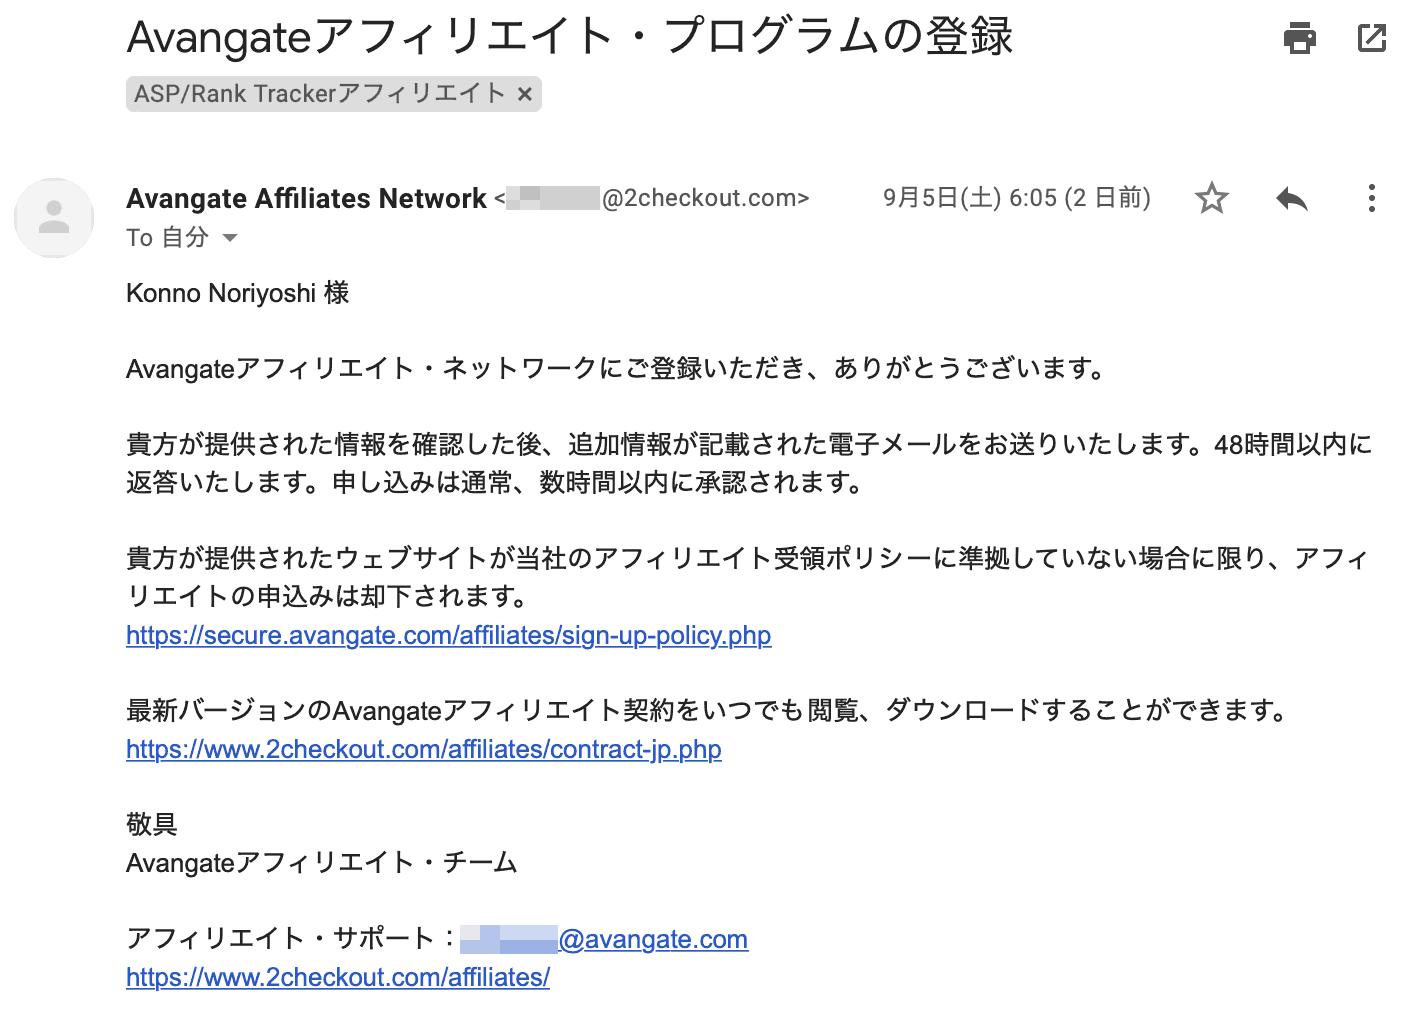 Avangateアカウント登録8